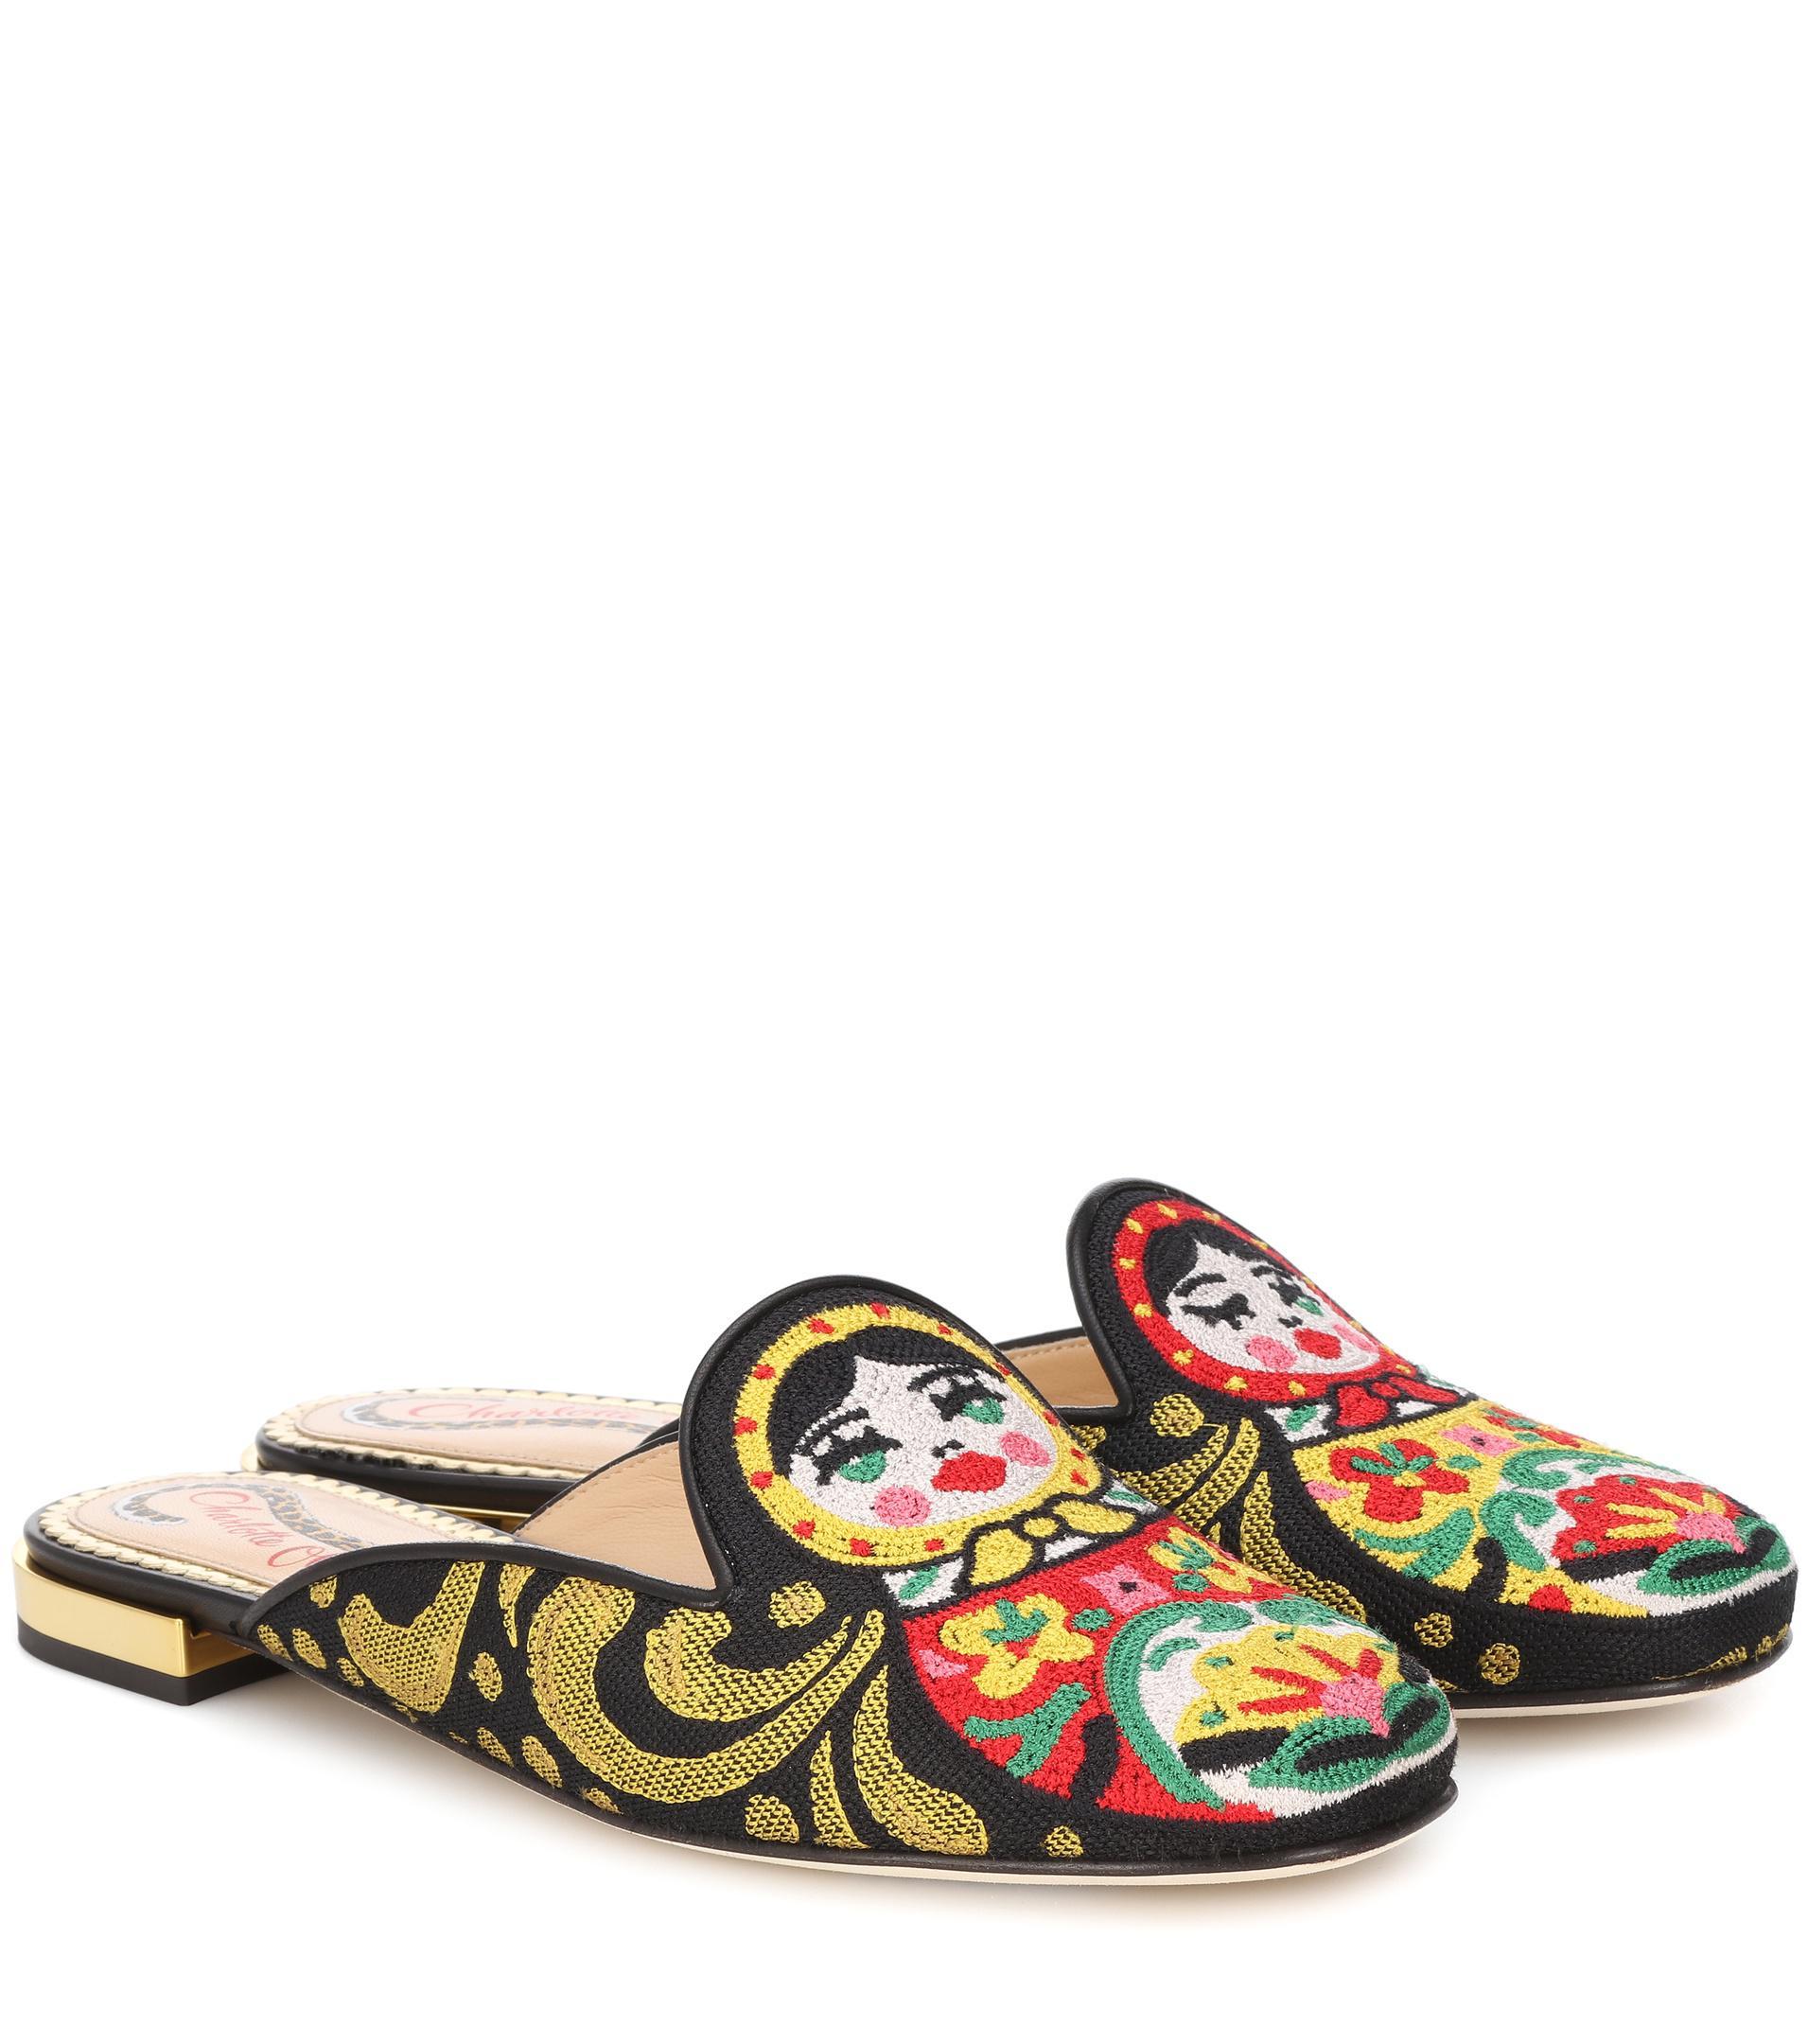 Charlotte Olympia Needlepoint matryoshka slippers fMHYE